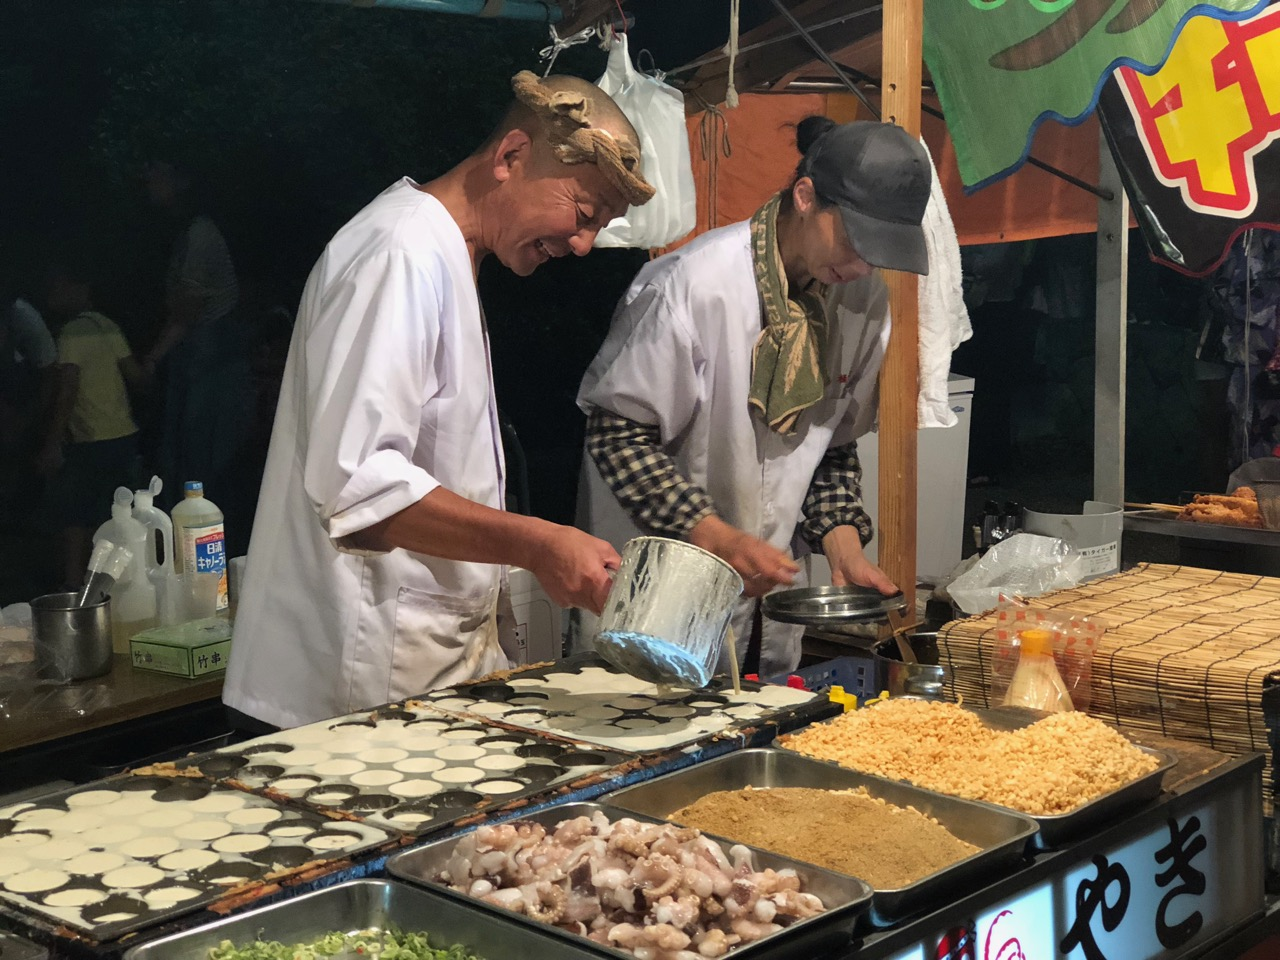 Sakai Oouo Yoichi Festival (aka Sakai Big Fish Night Market)